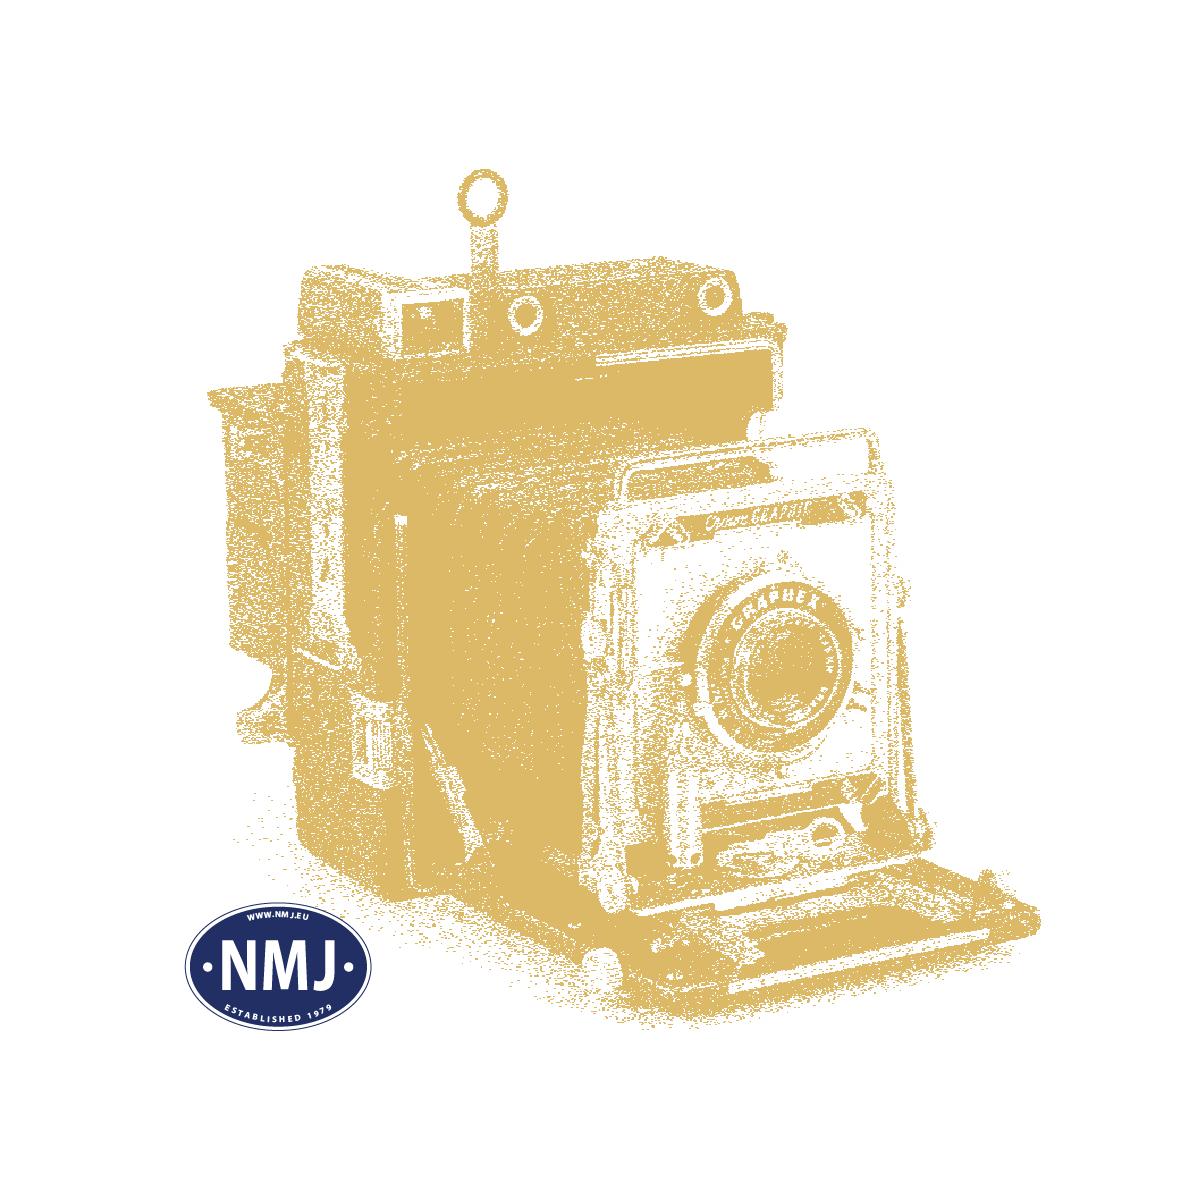 WODST1419 - Profilplater, Isopor